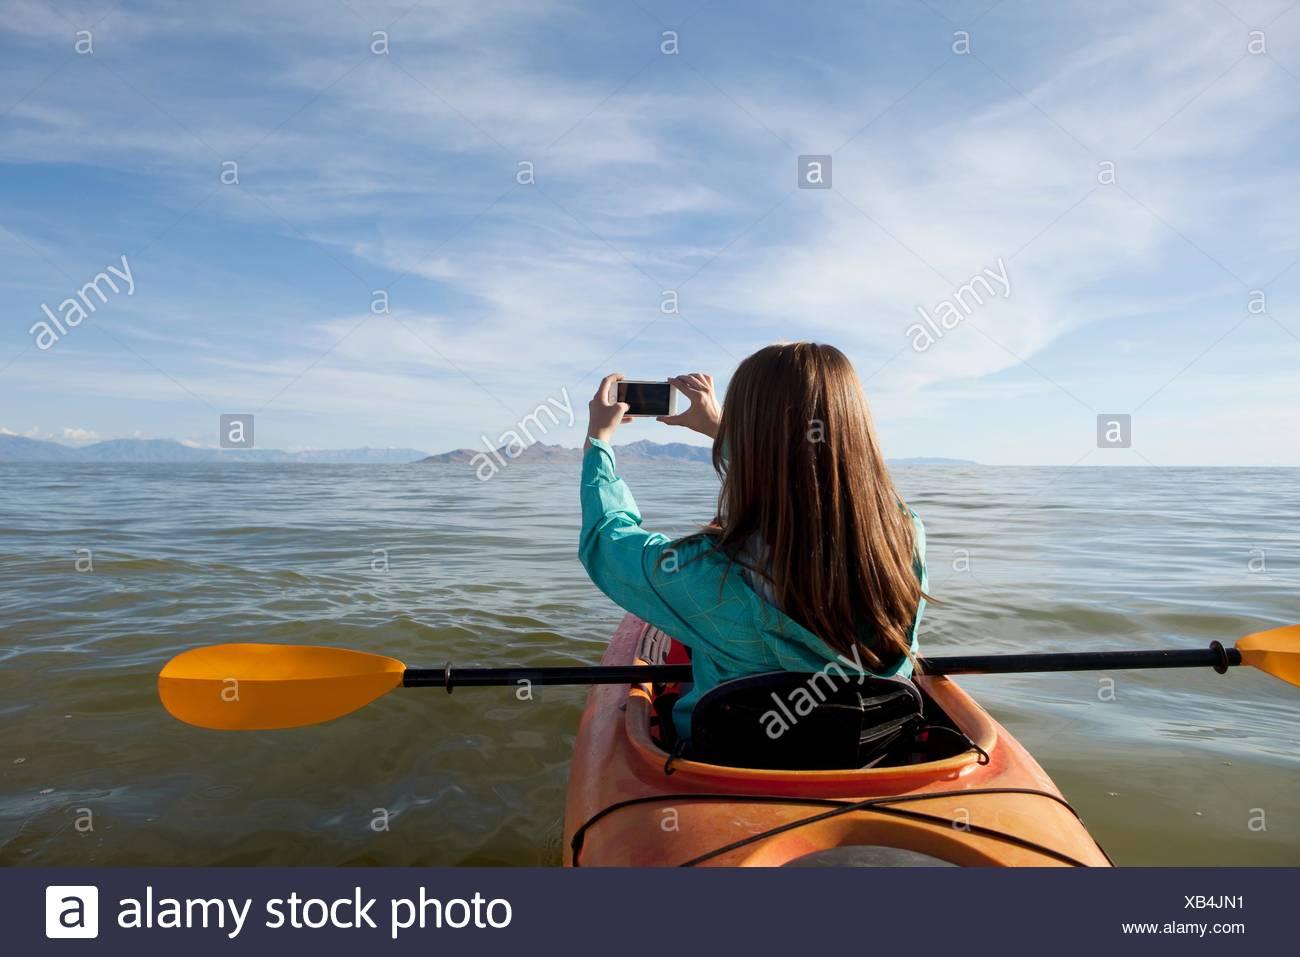 Rear view of young woman in kayak taking photograph, Great Salt Lake, Utah, USA Stock Photo